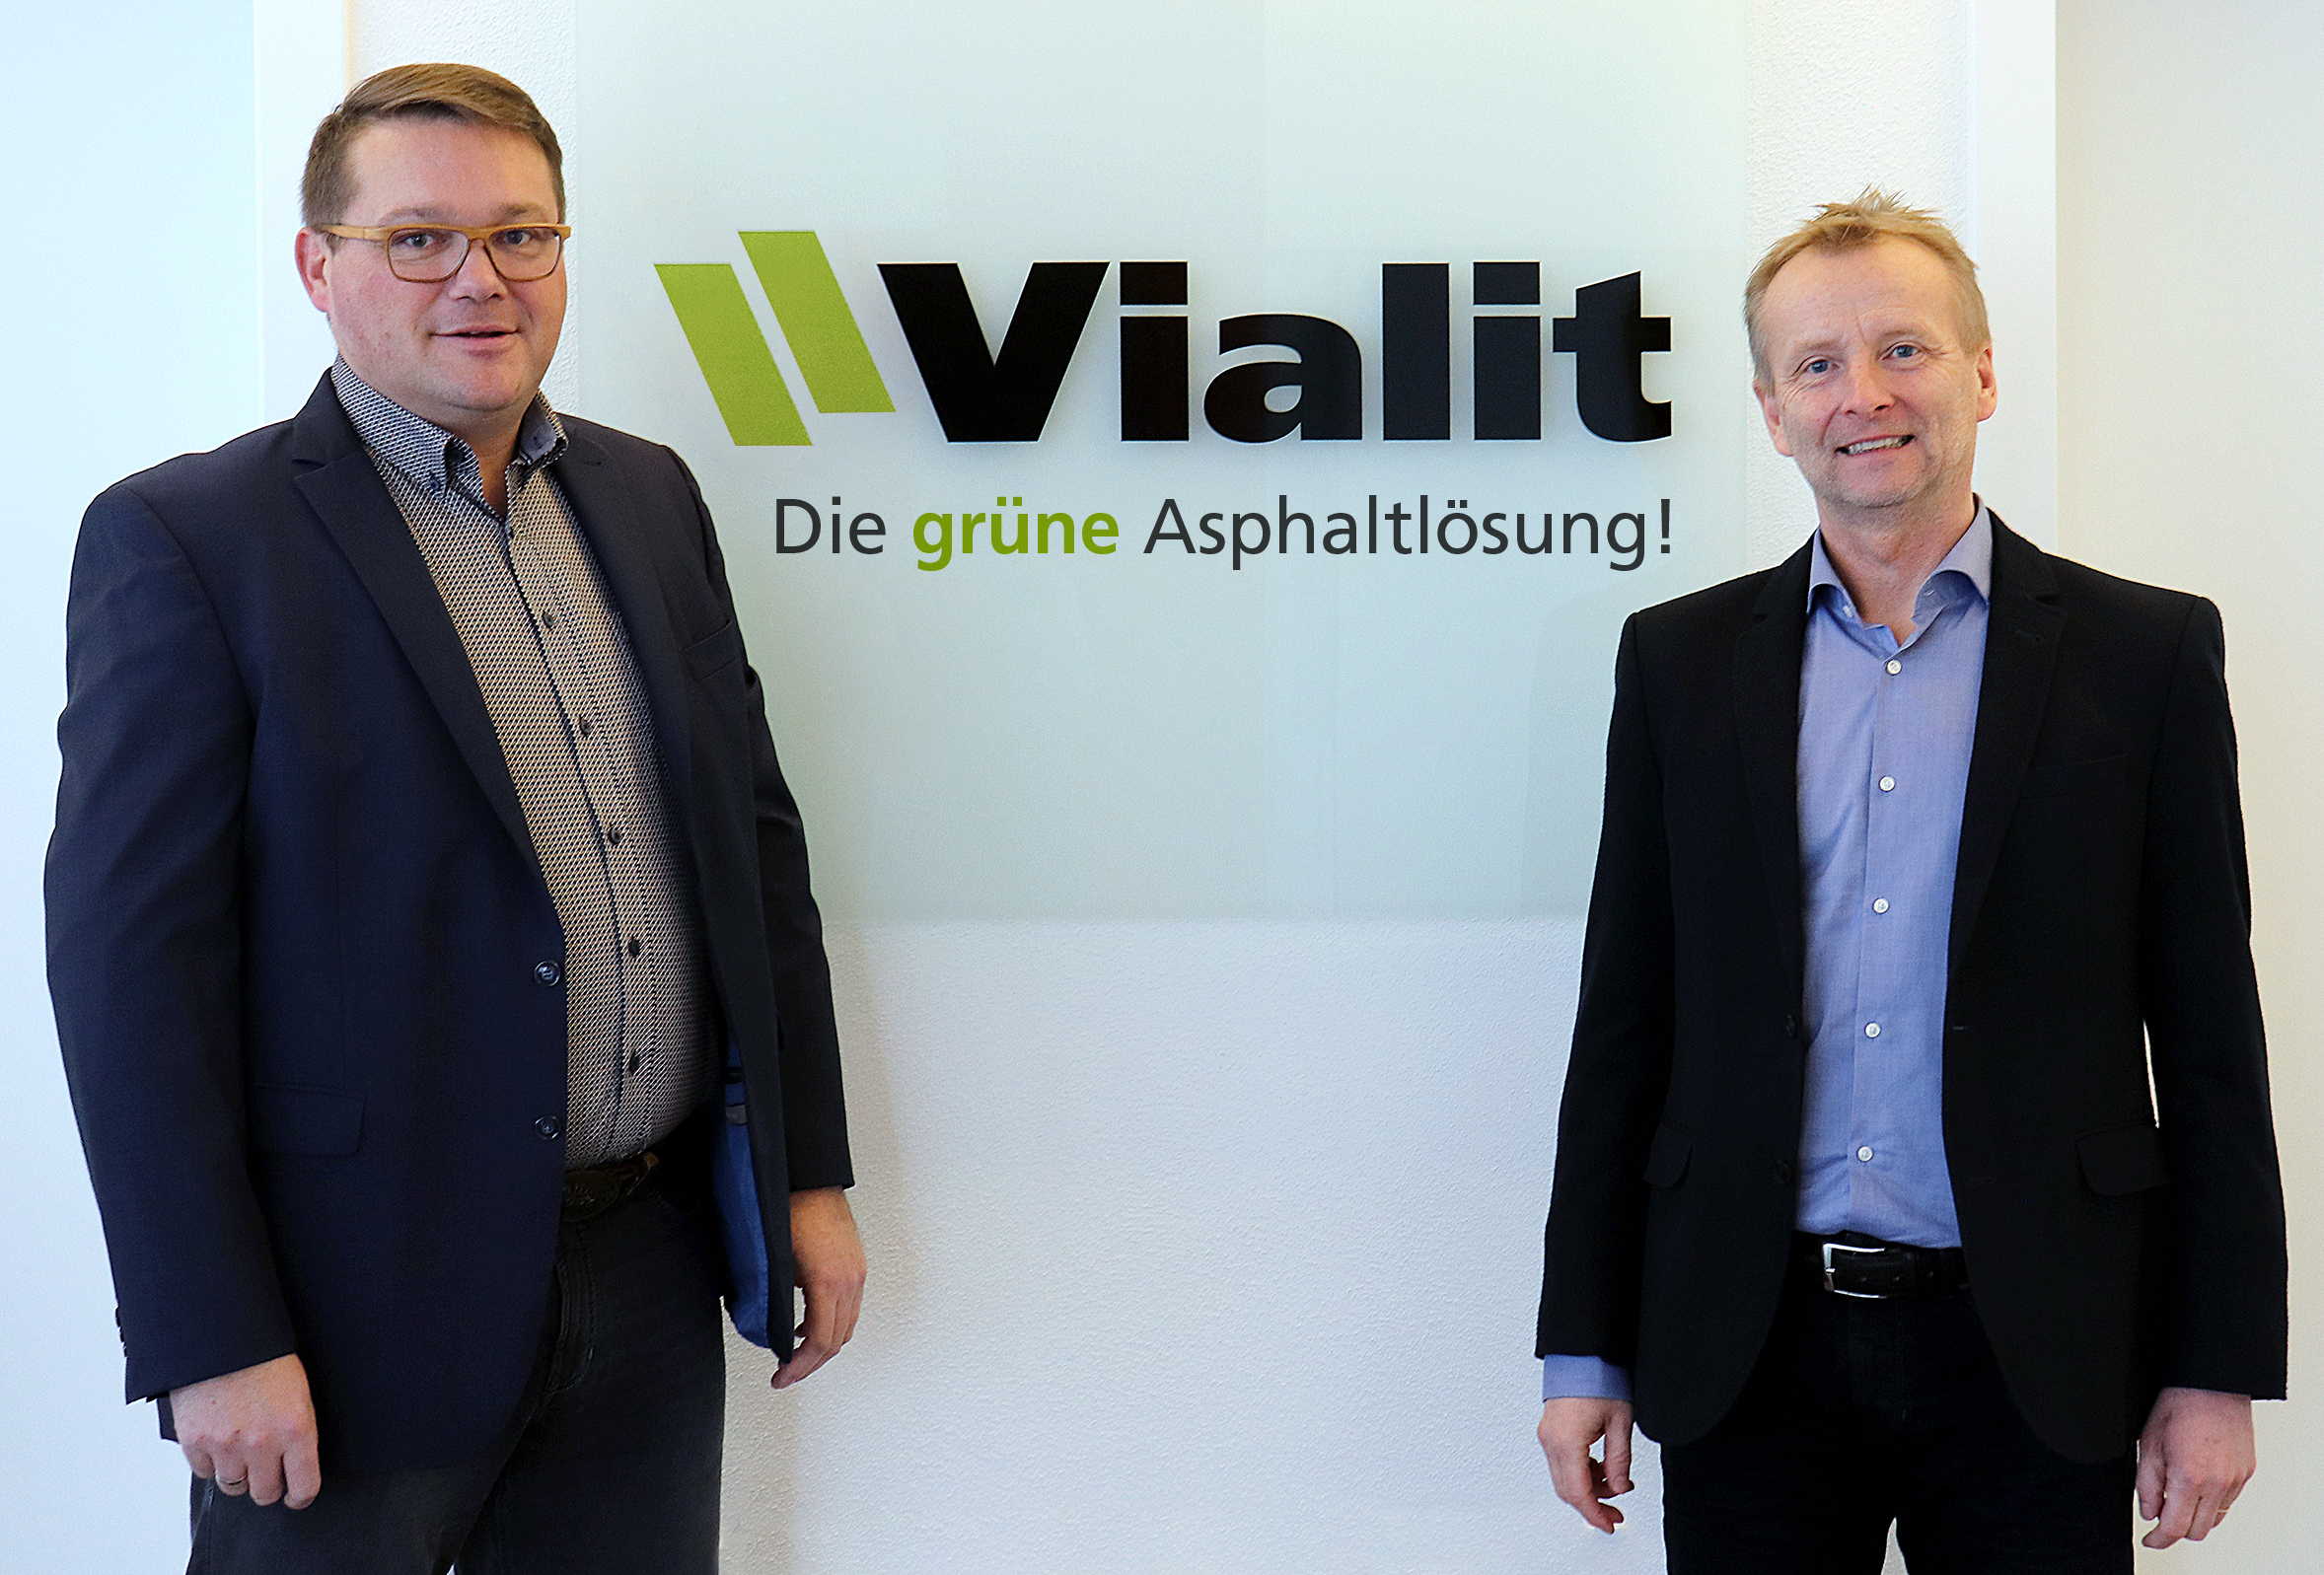 Mikrobelag GmbH wird Vialit GmbH